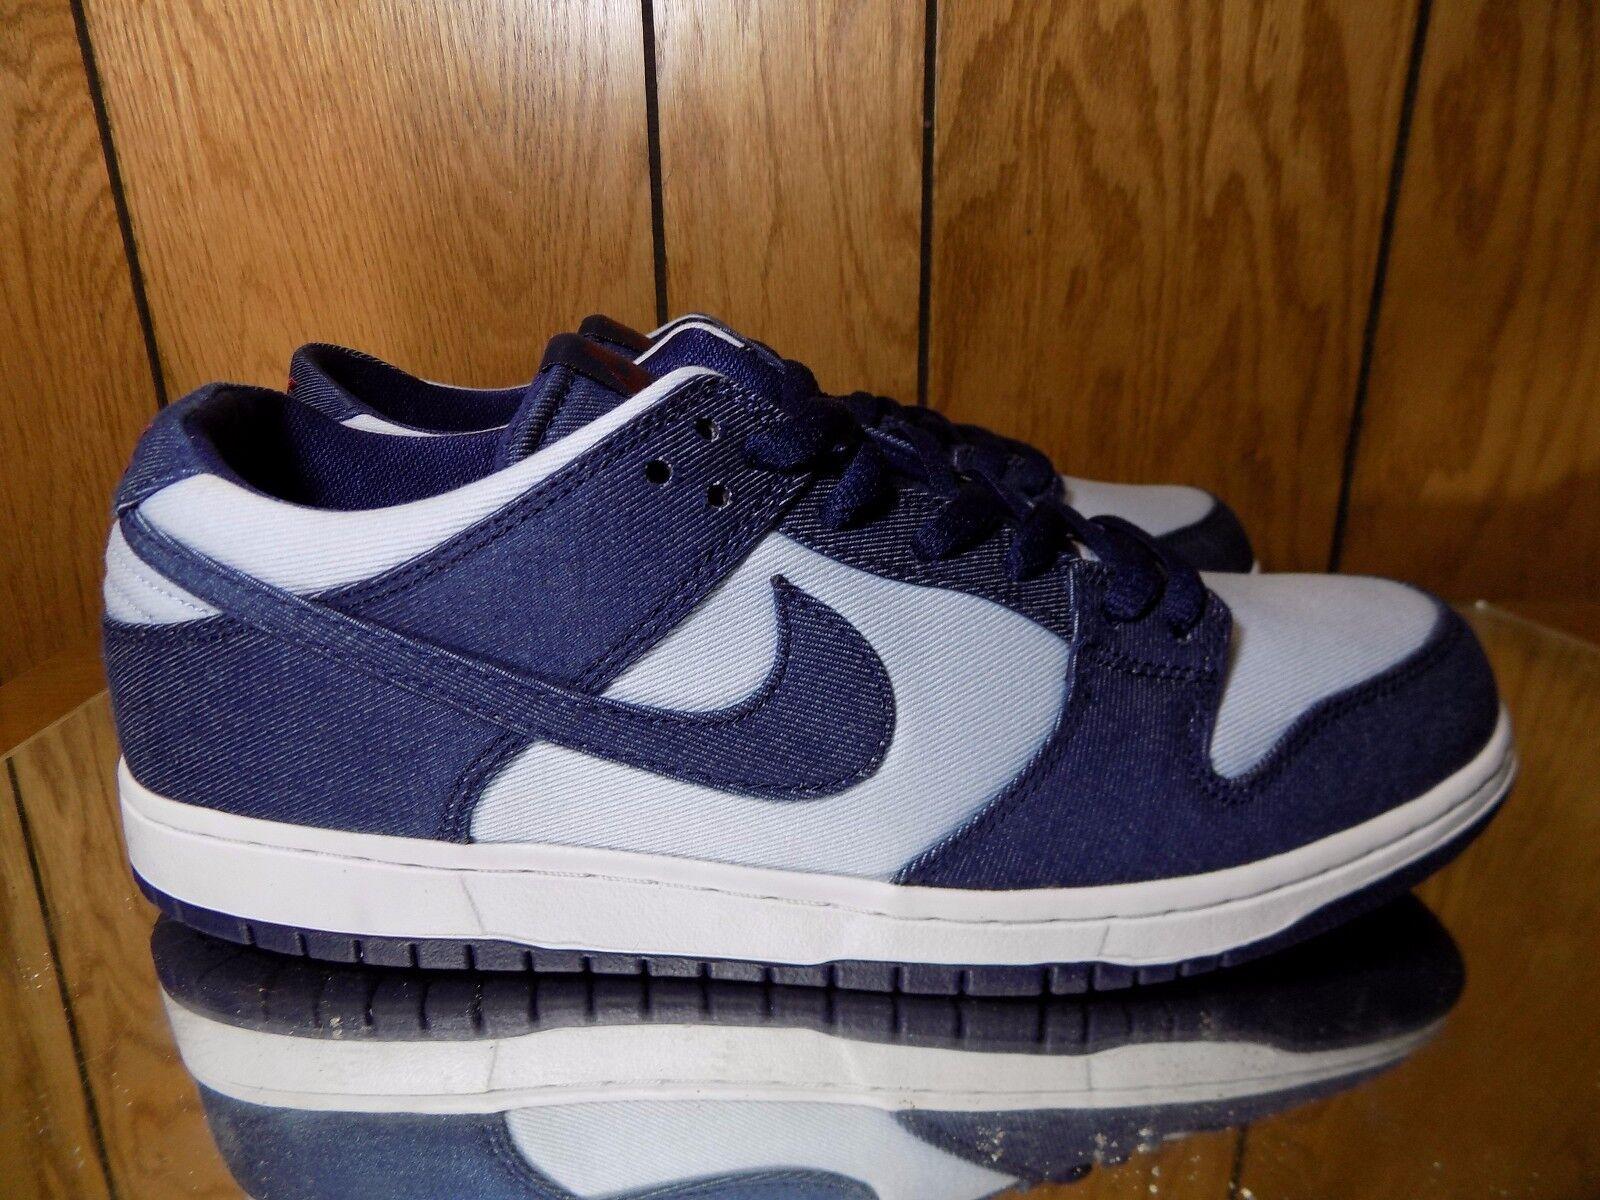 Nike sb schiacciare low pro jeans blu - 854866-444 binario